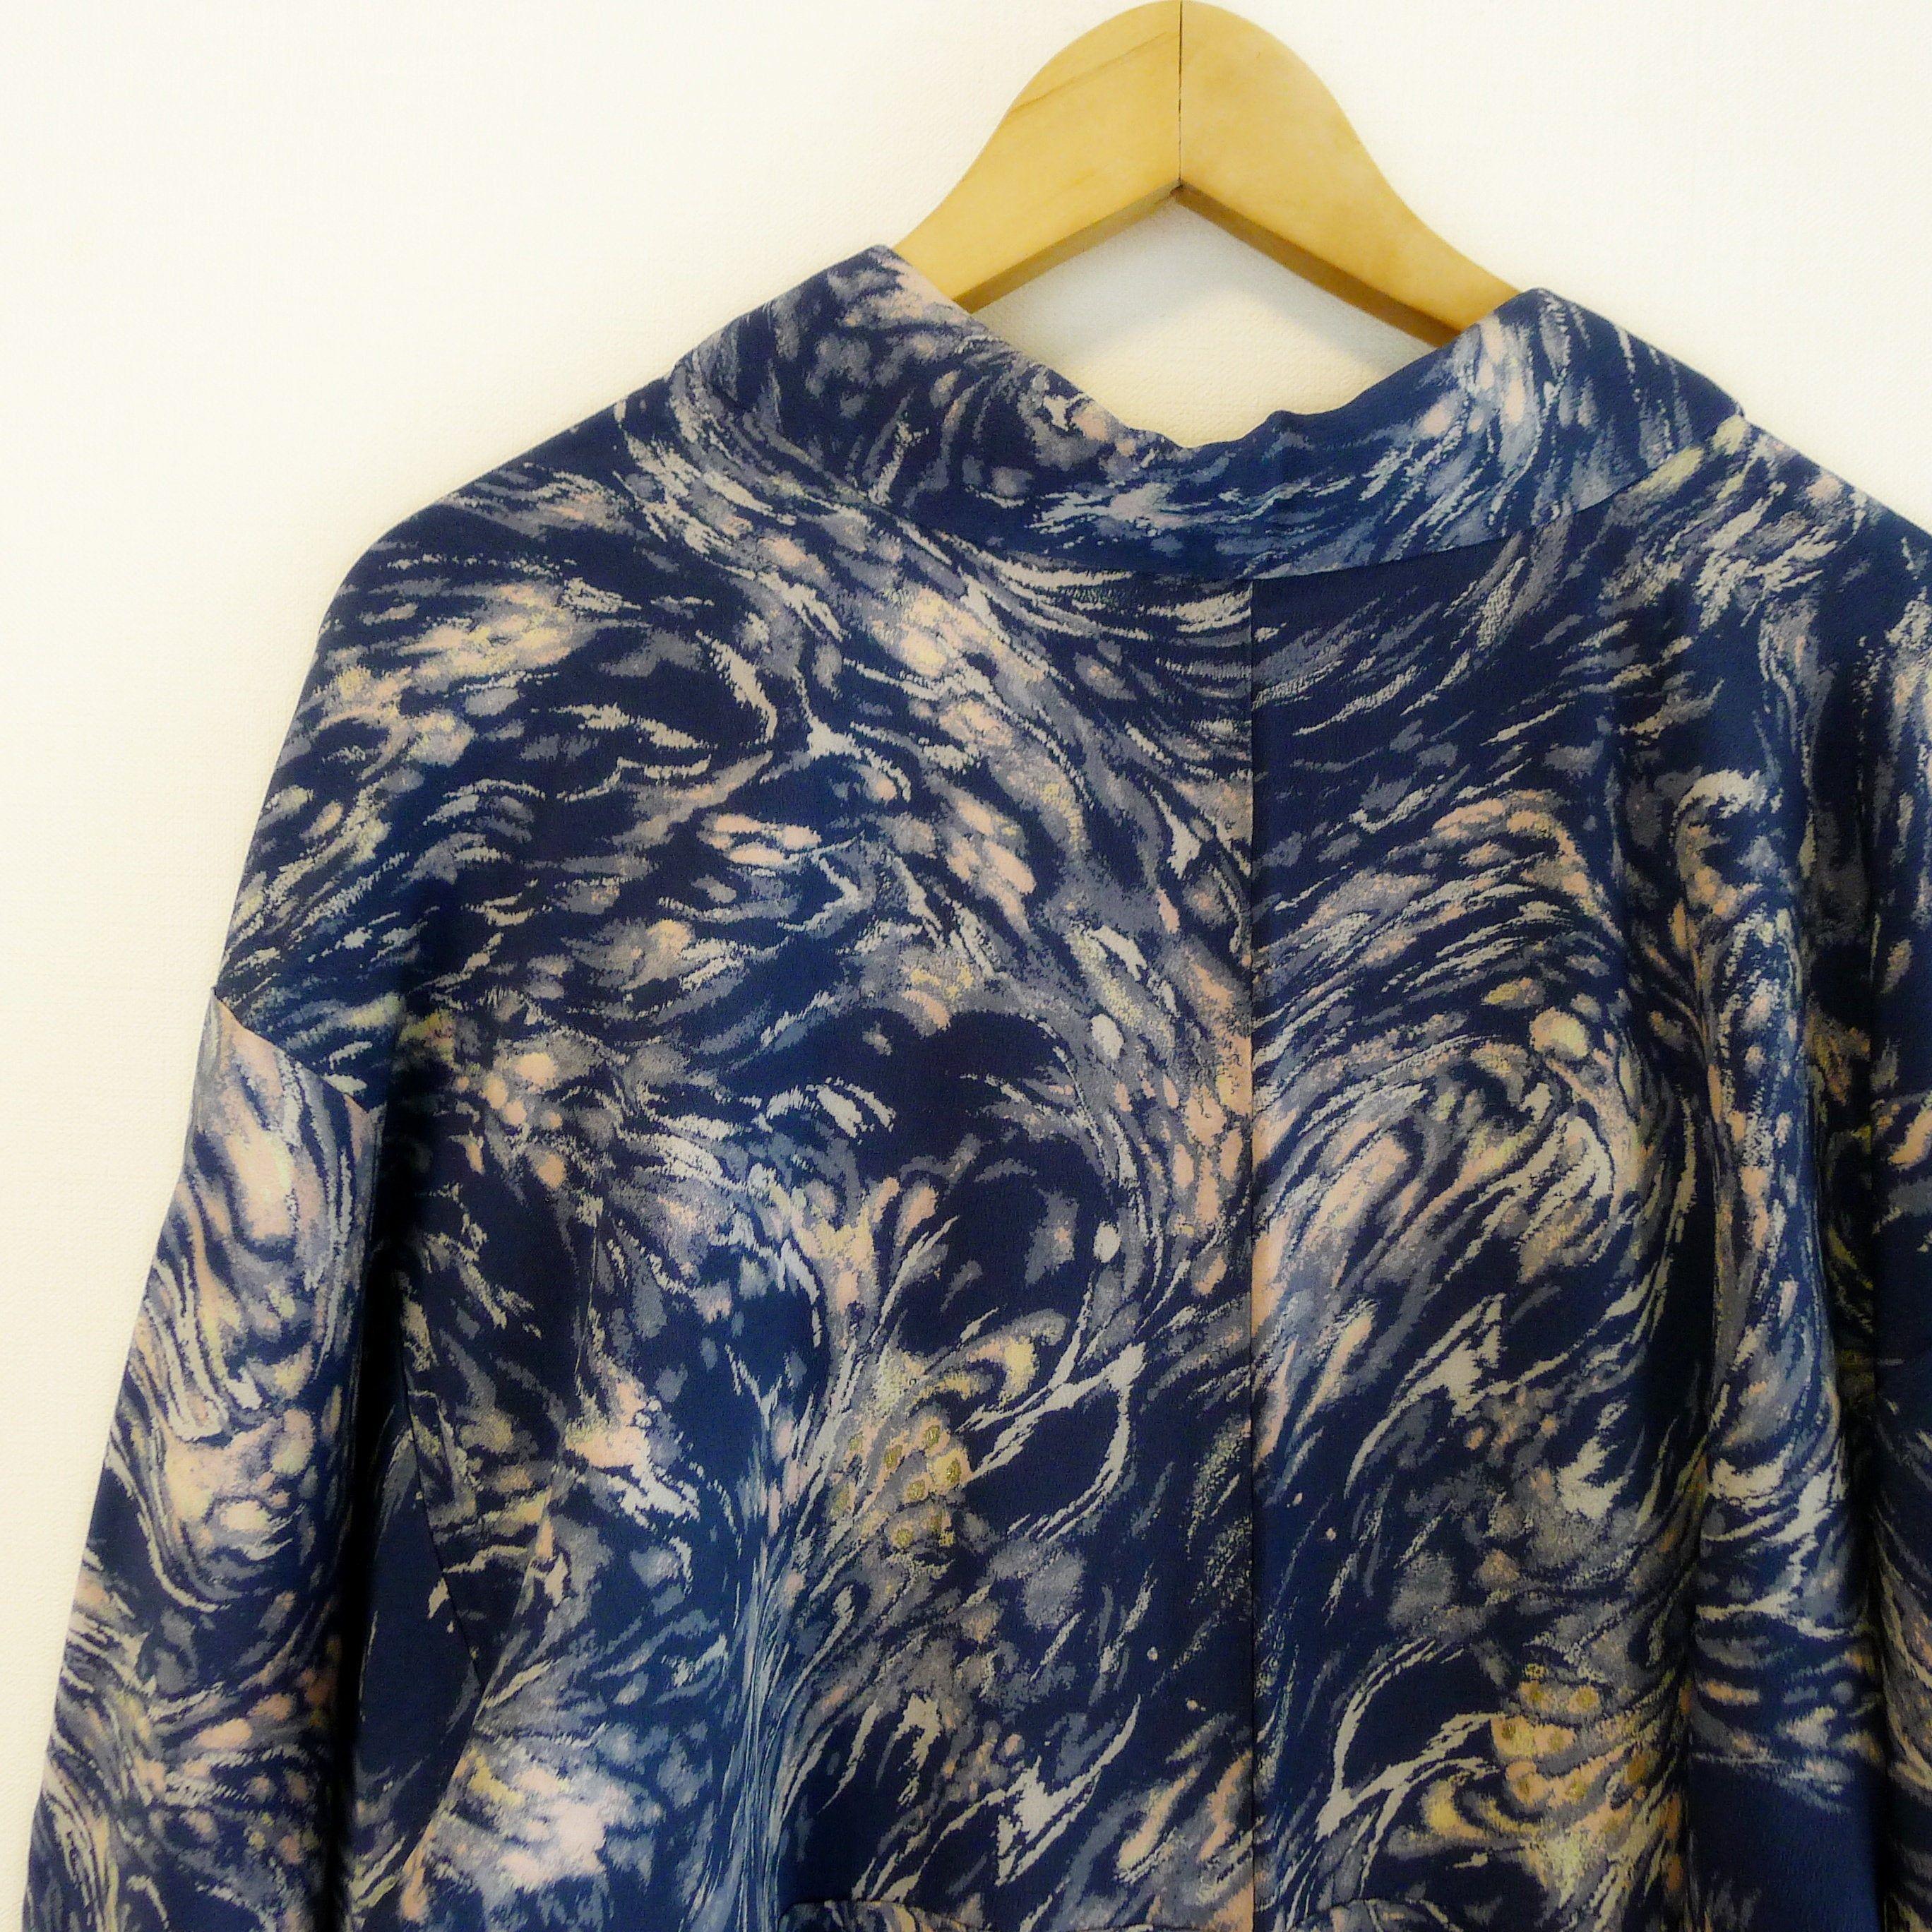 Stunning antique Japanese kimono, dark blue and cloudy sky